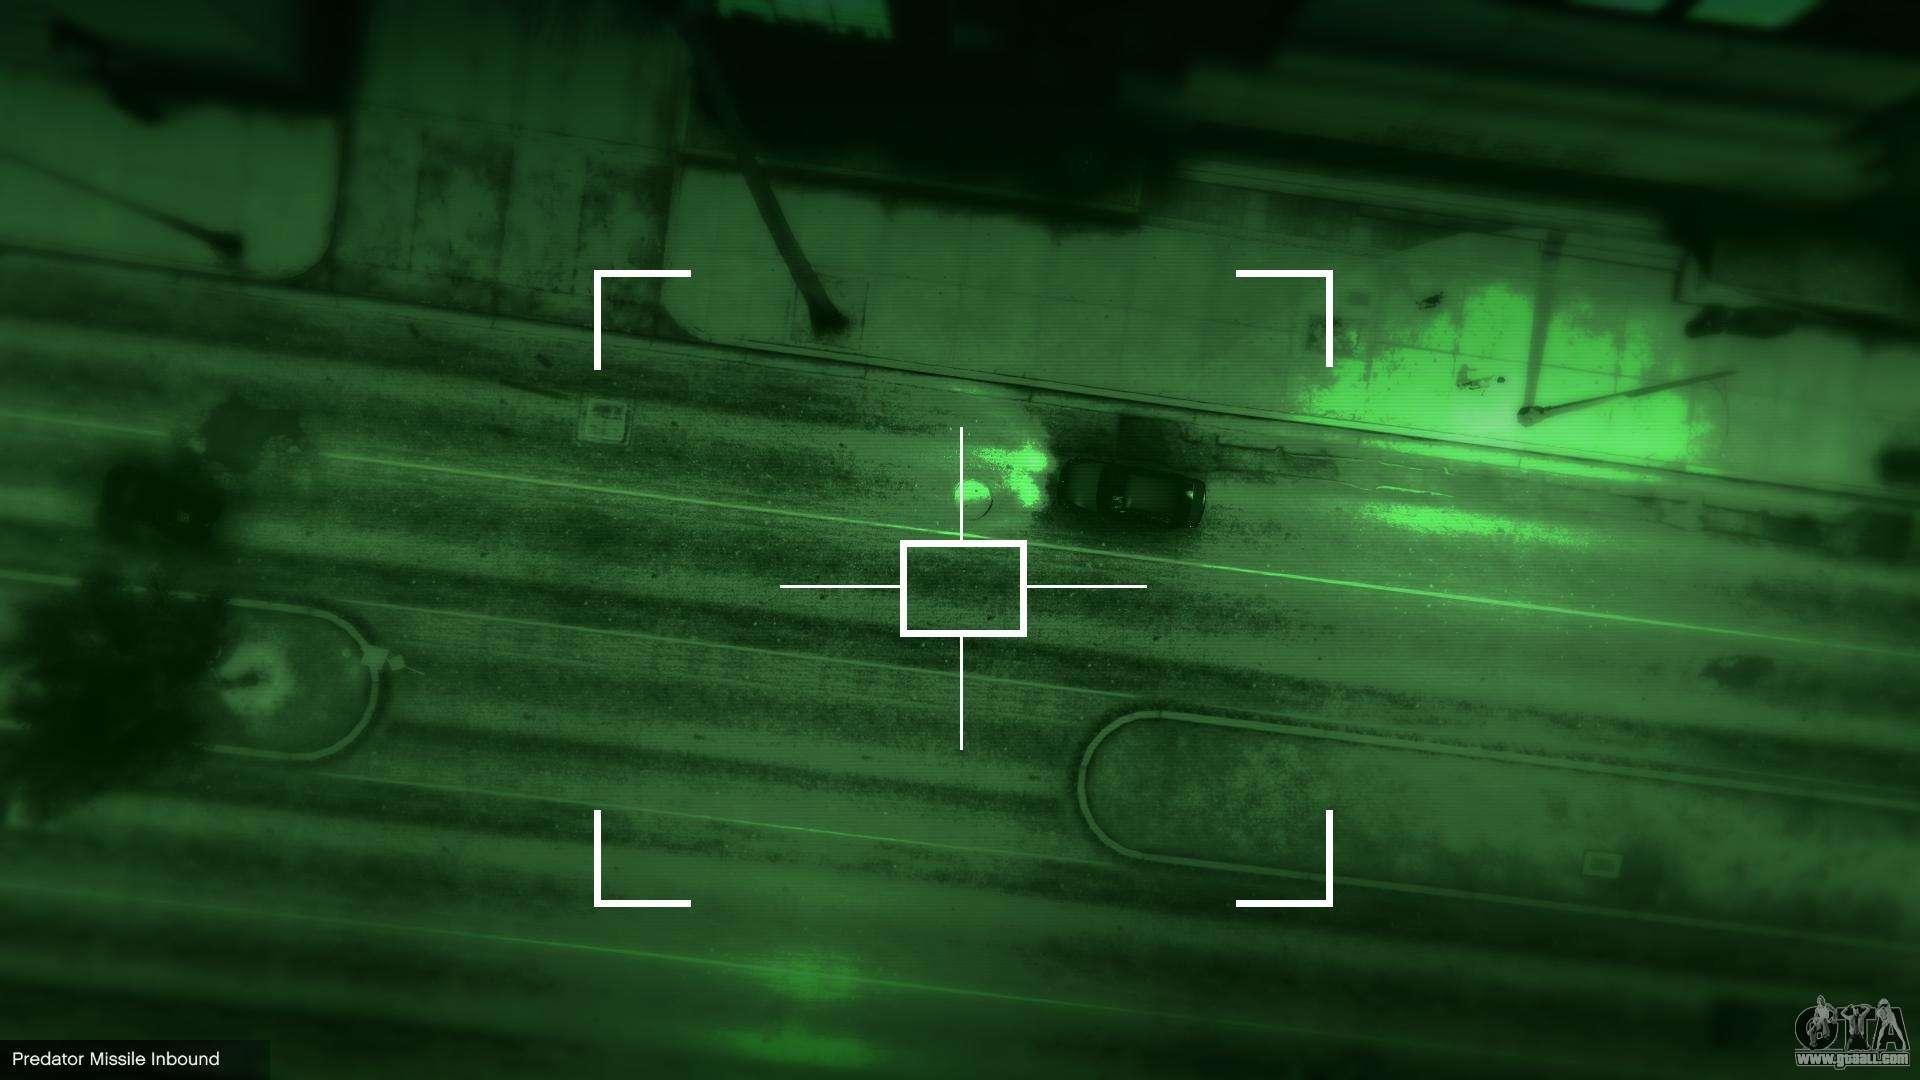 MW2 Predator Missile 1 1 for GTA 5